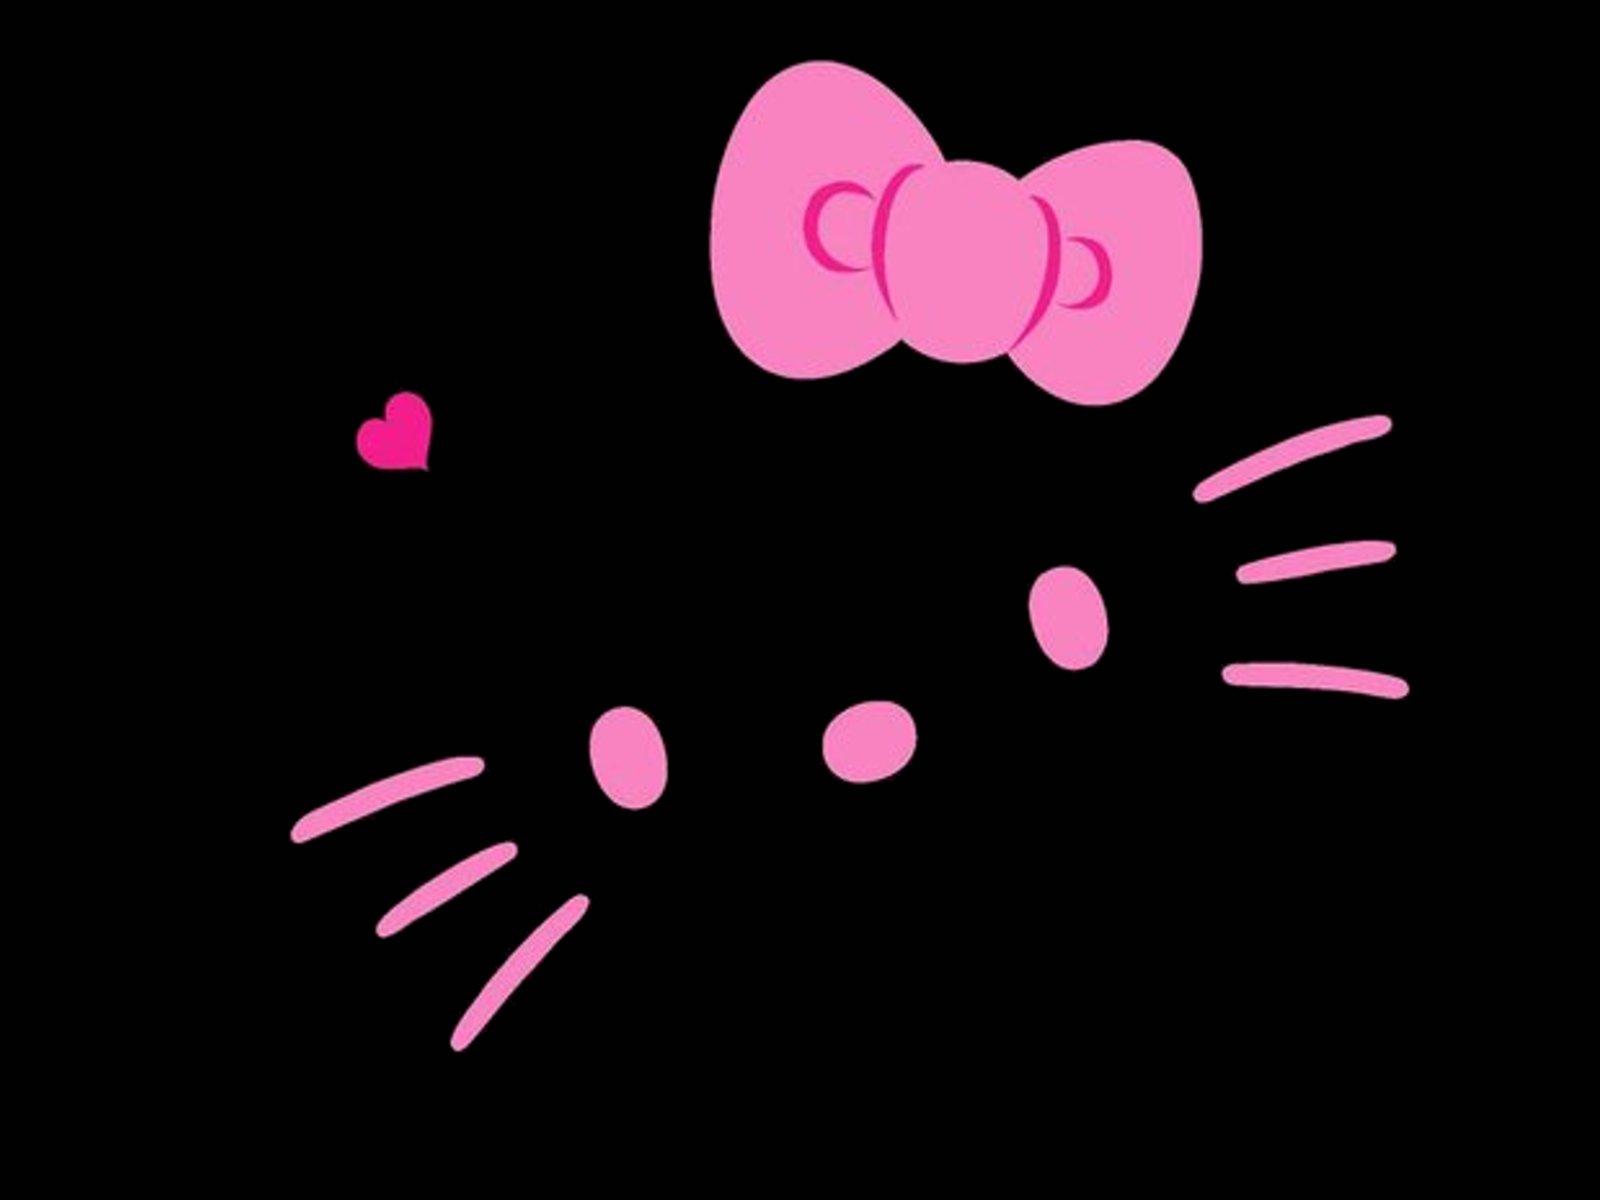 Cute Black And Pink Wallpaper 1 Wallpaper   Hdblackwallpapercom 1600x1200